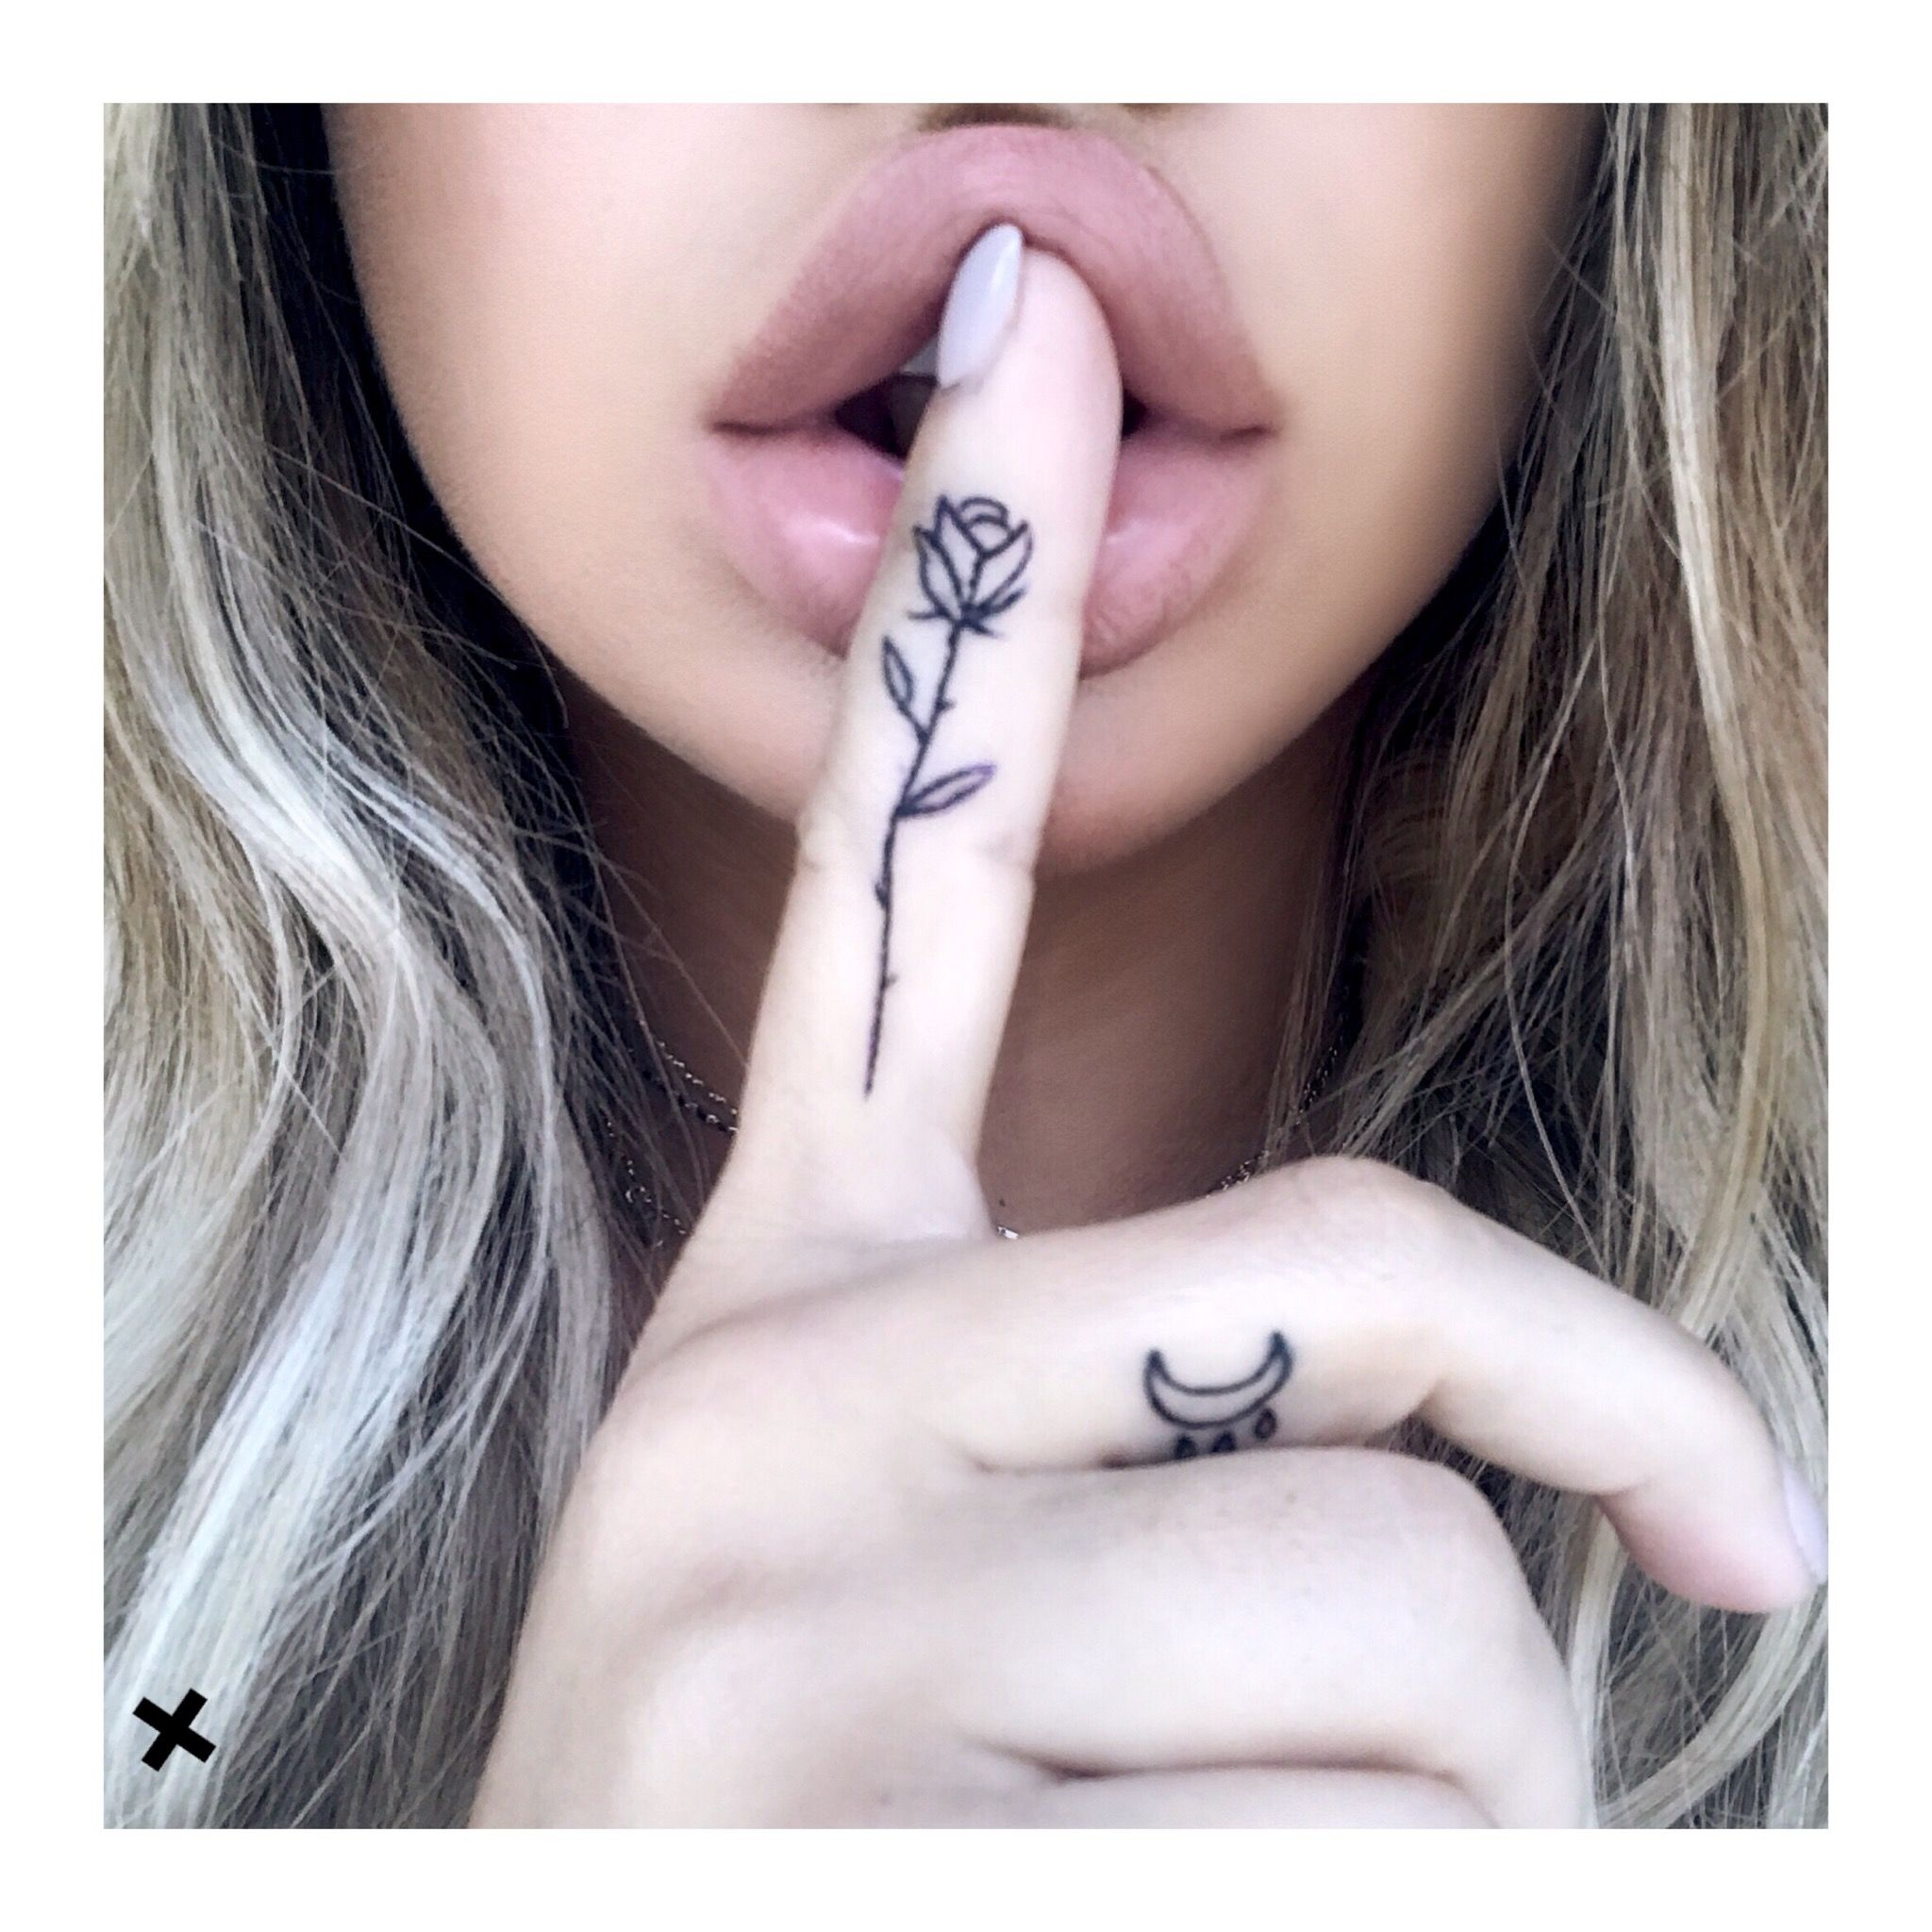 Tattoos On Pinterest: Pinterest: @ Volkthorn↟ #tatuajes_en_los_dedos_finger